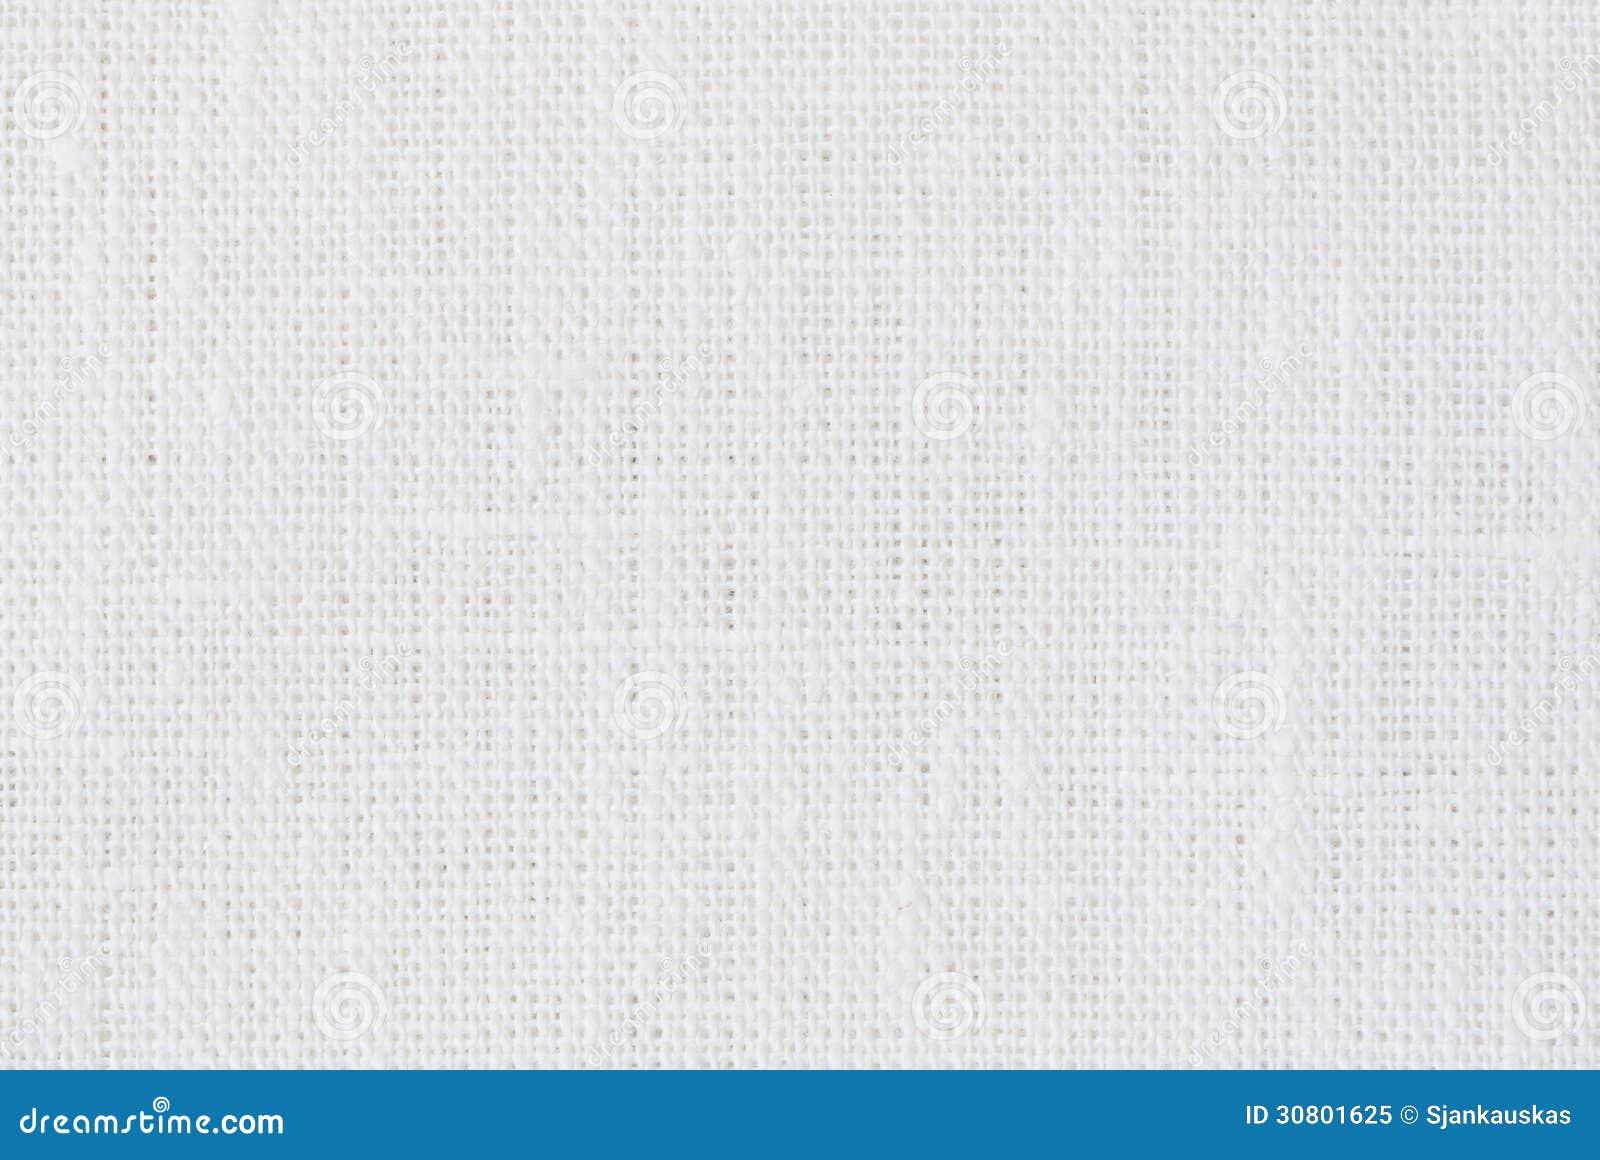 fond de toile blanc de texture image stock image 30801625. Black Bedroom Furniture Sets. Home Design Ideas